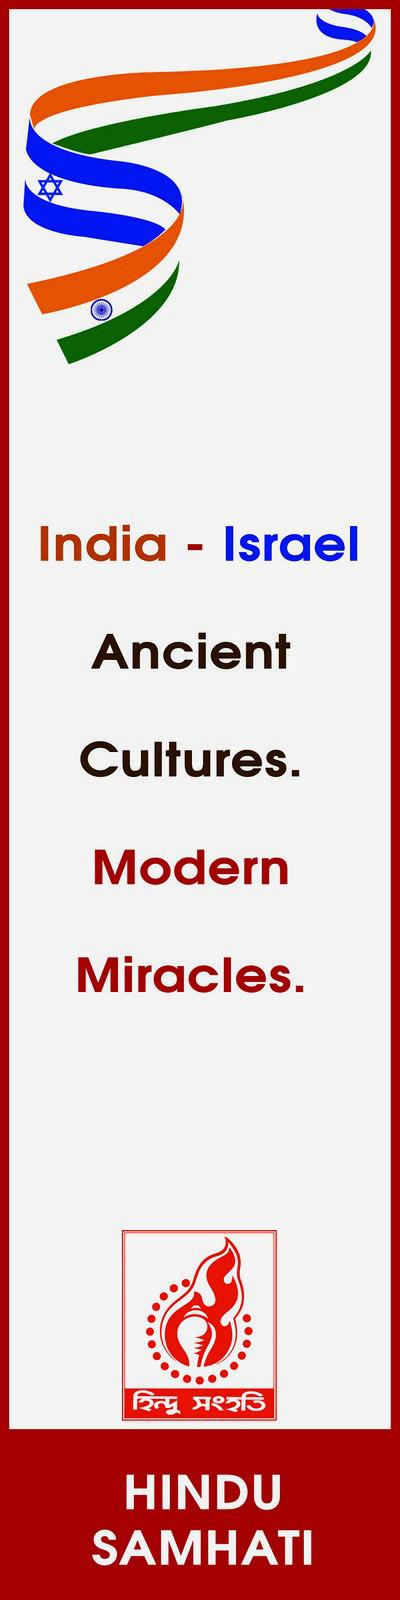 India-Israel Ancient Cultures banner - Hindu Samhati